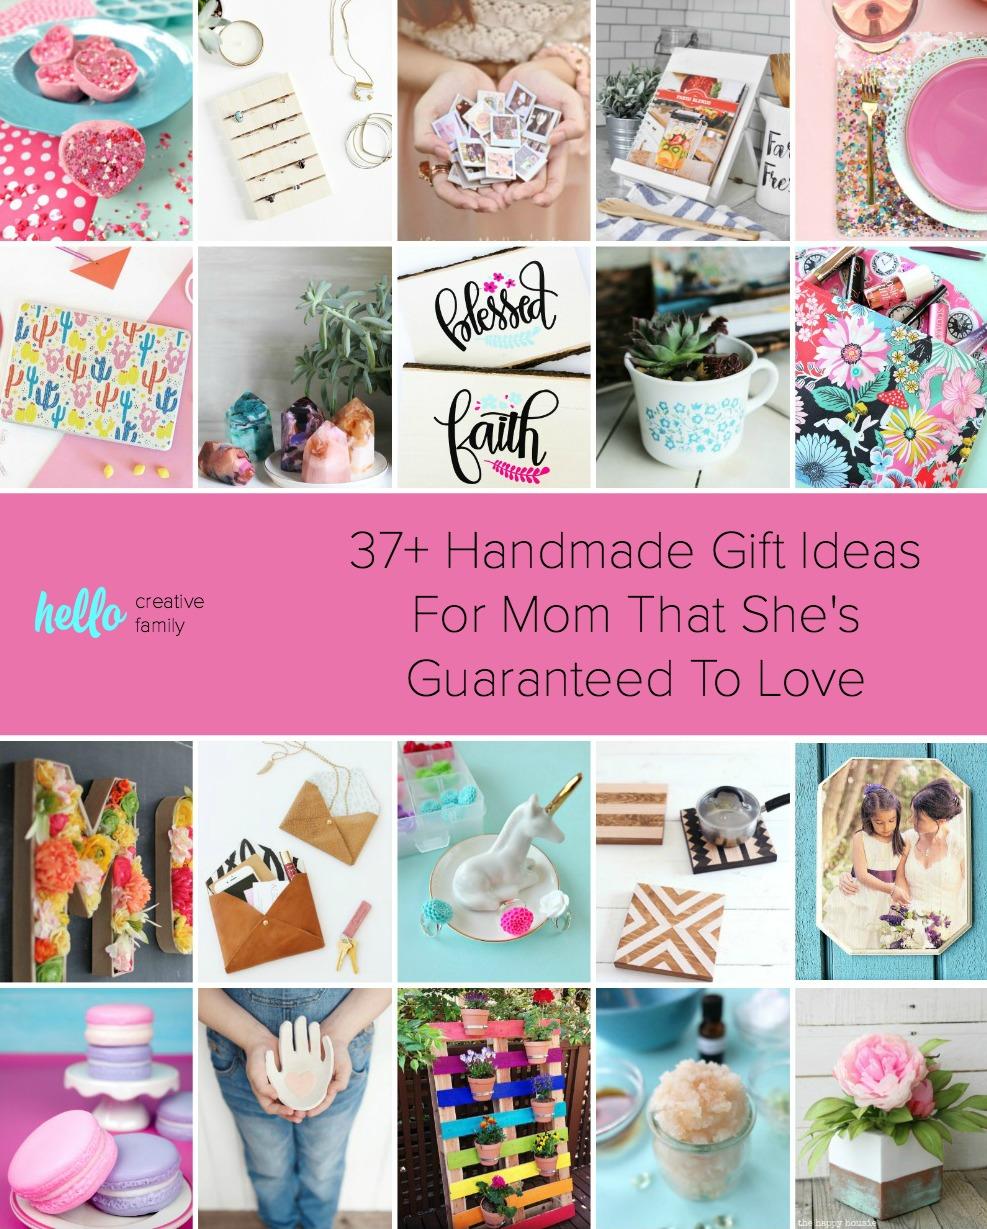 37 handmade gift ideas